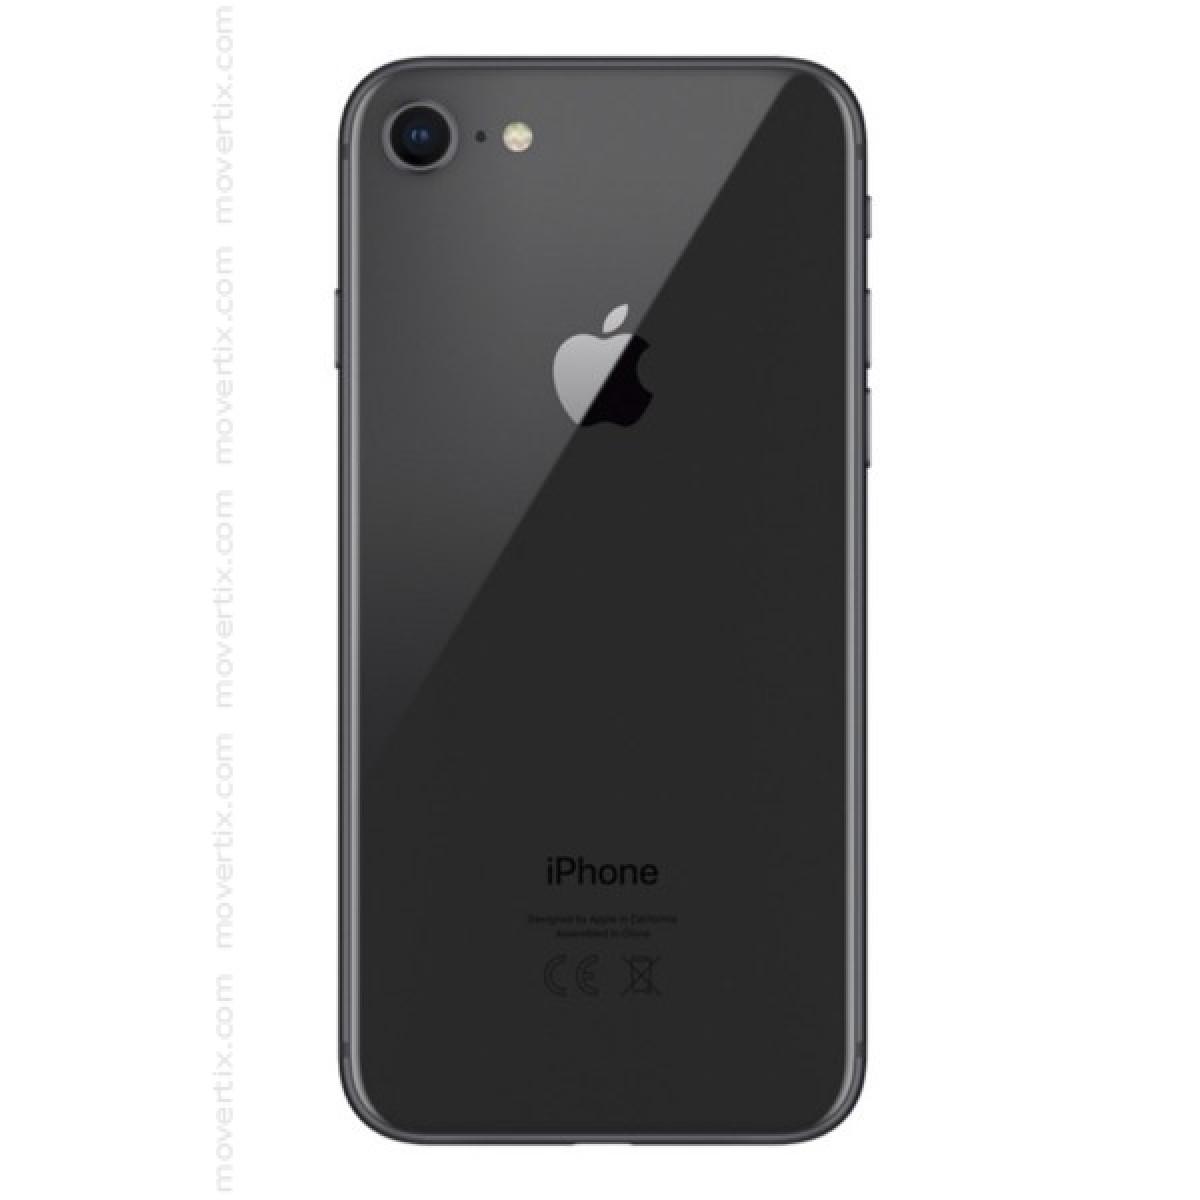 iPhone 8 Space Grey 64GB (0190198450975) | Movertix Mobile Phones Shop